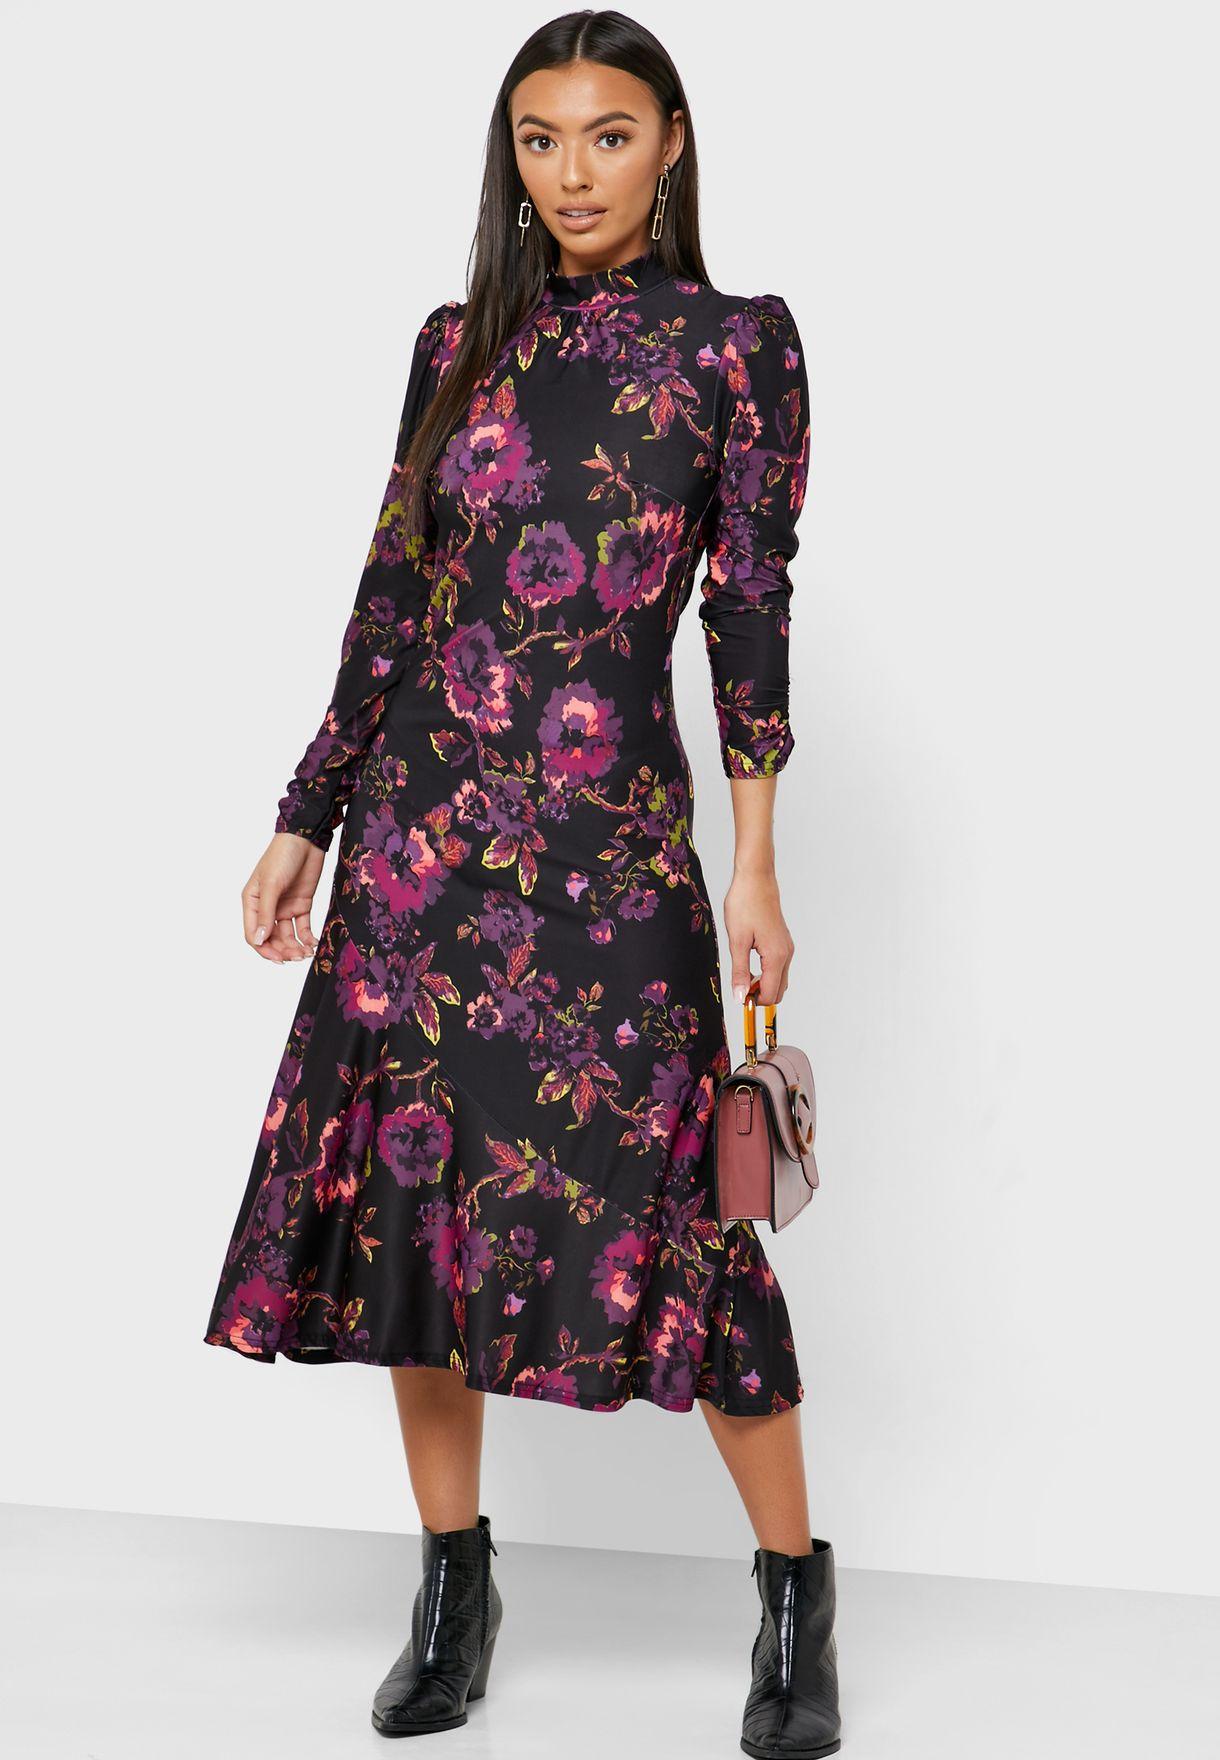 Floral Print High Neck Dress